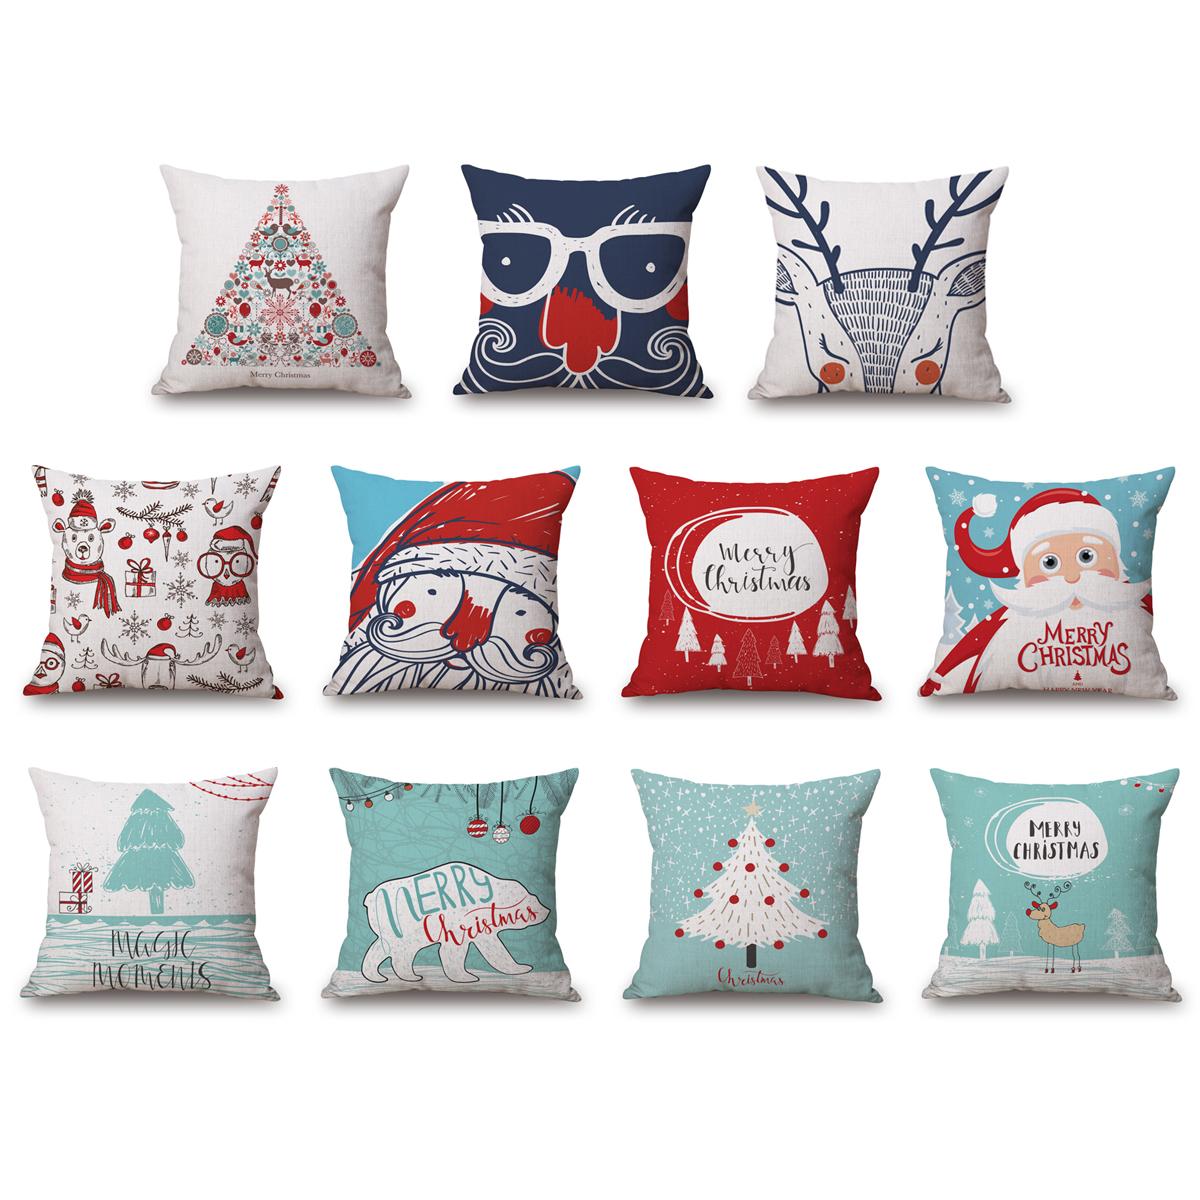 A Cushion Cover Snowman // Elk // Santa Waist Throw Pillow Cover Janly/® 4PC Merry Christmas Decorative Pillowcases 18x18